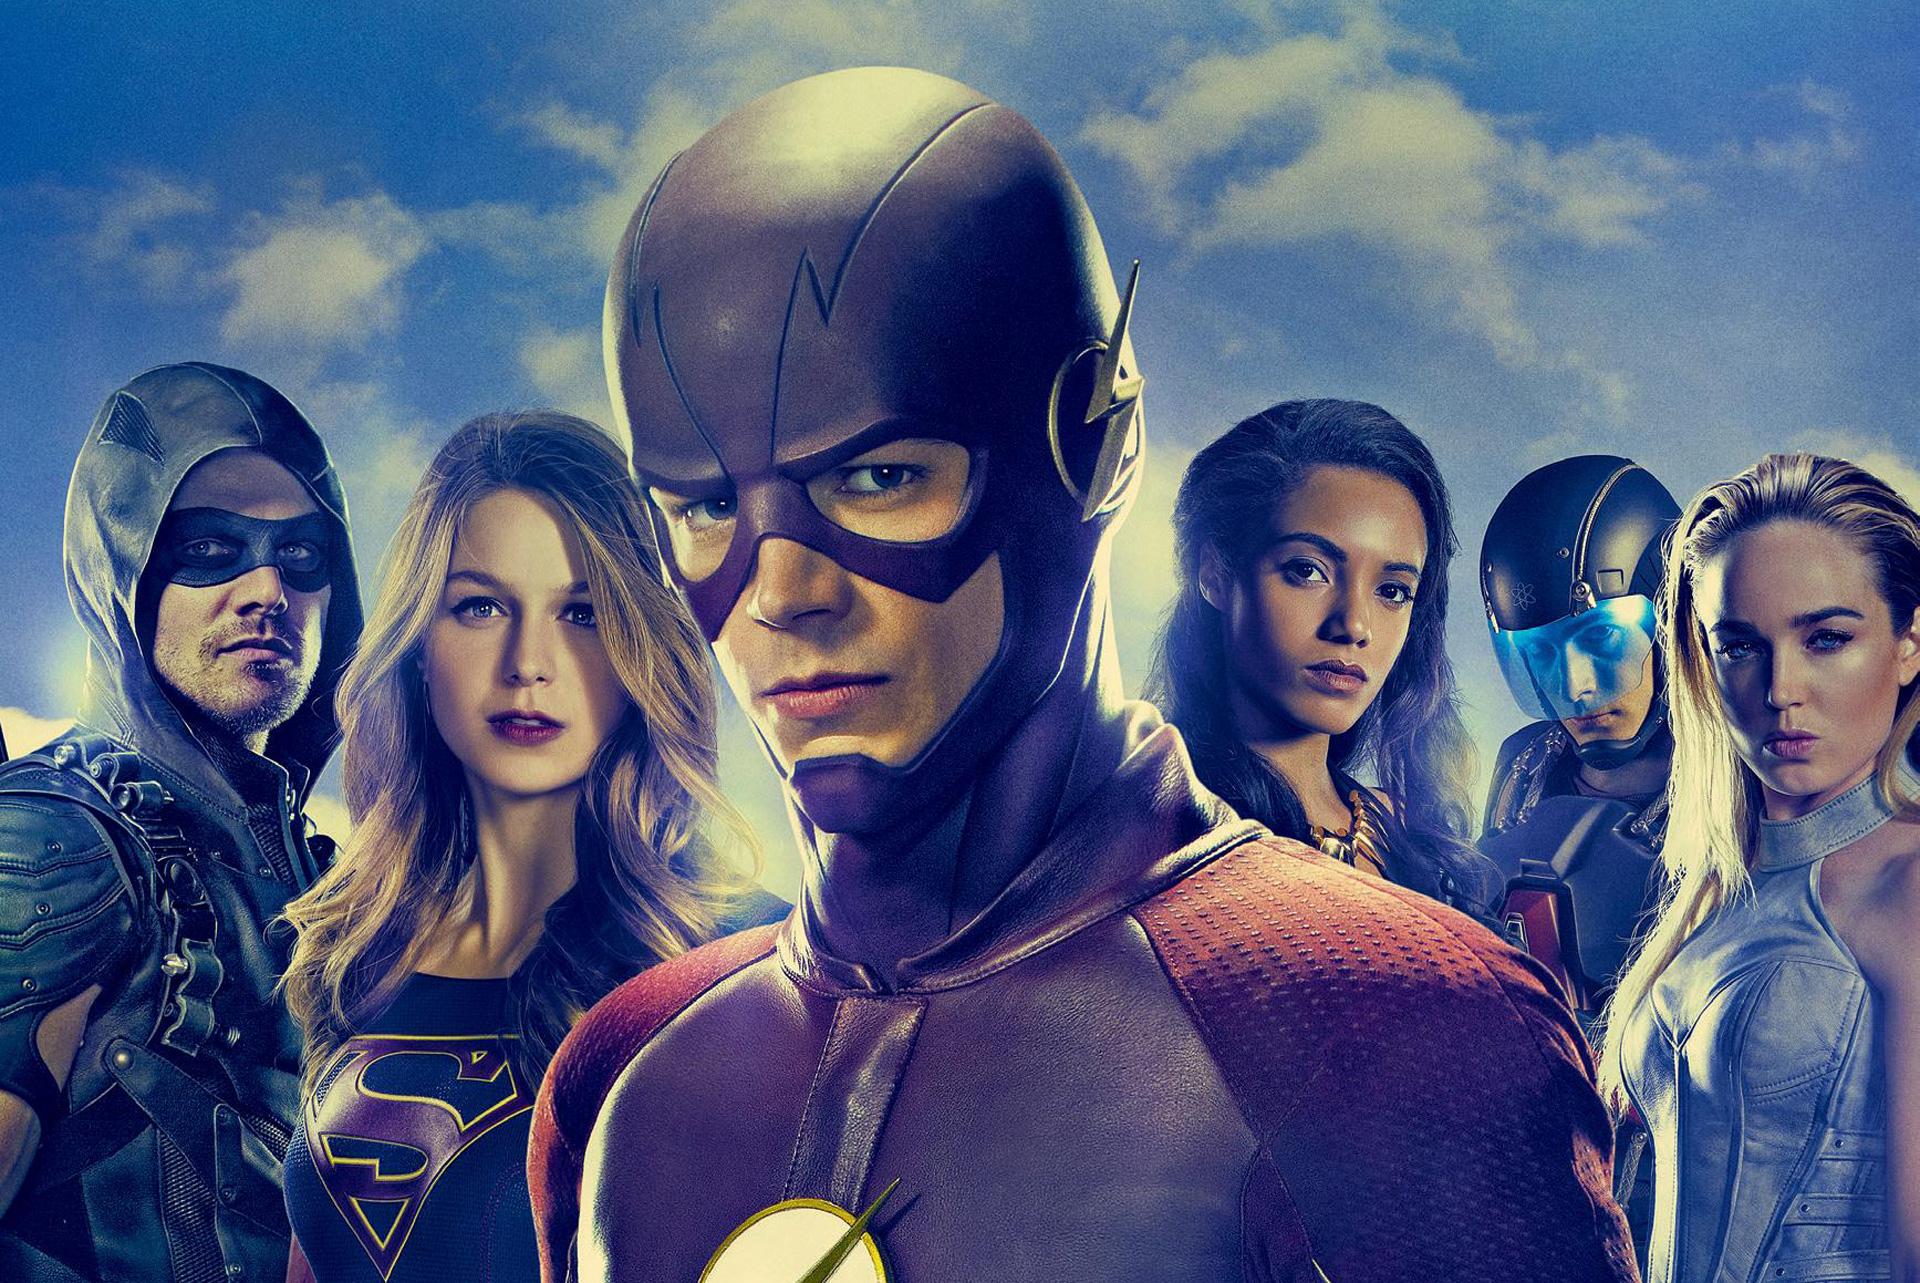 Revolution Tv Series Wallpapers: 2932x2932 Flash Supergirl Arrow Tv Series Ipad Pro Retina